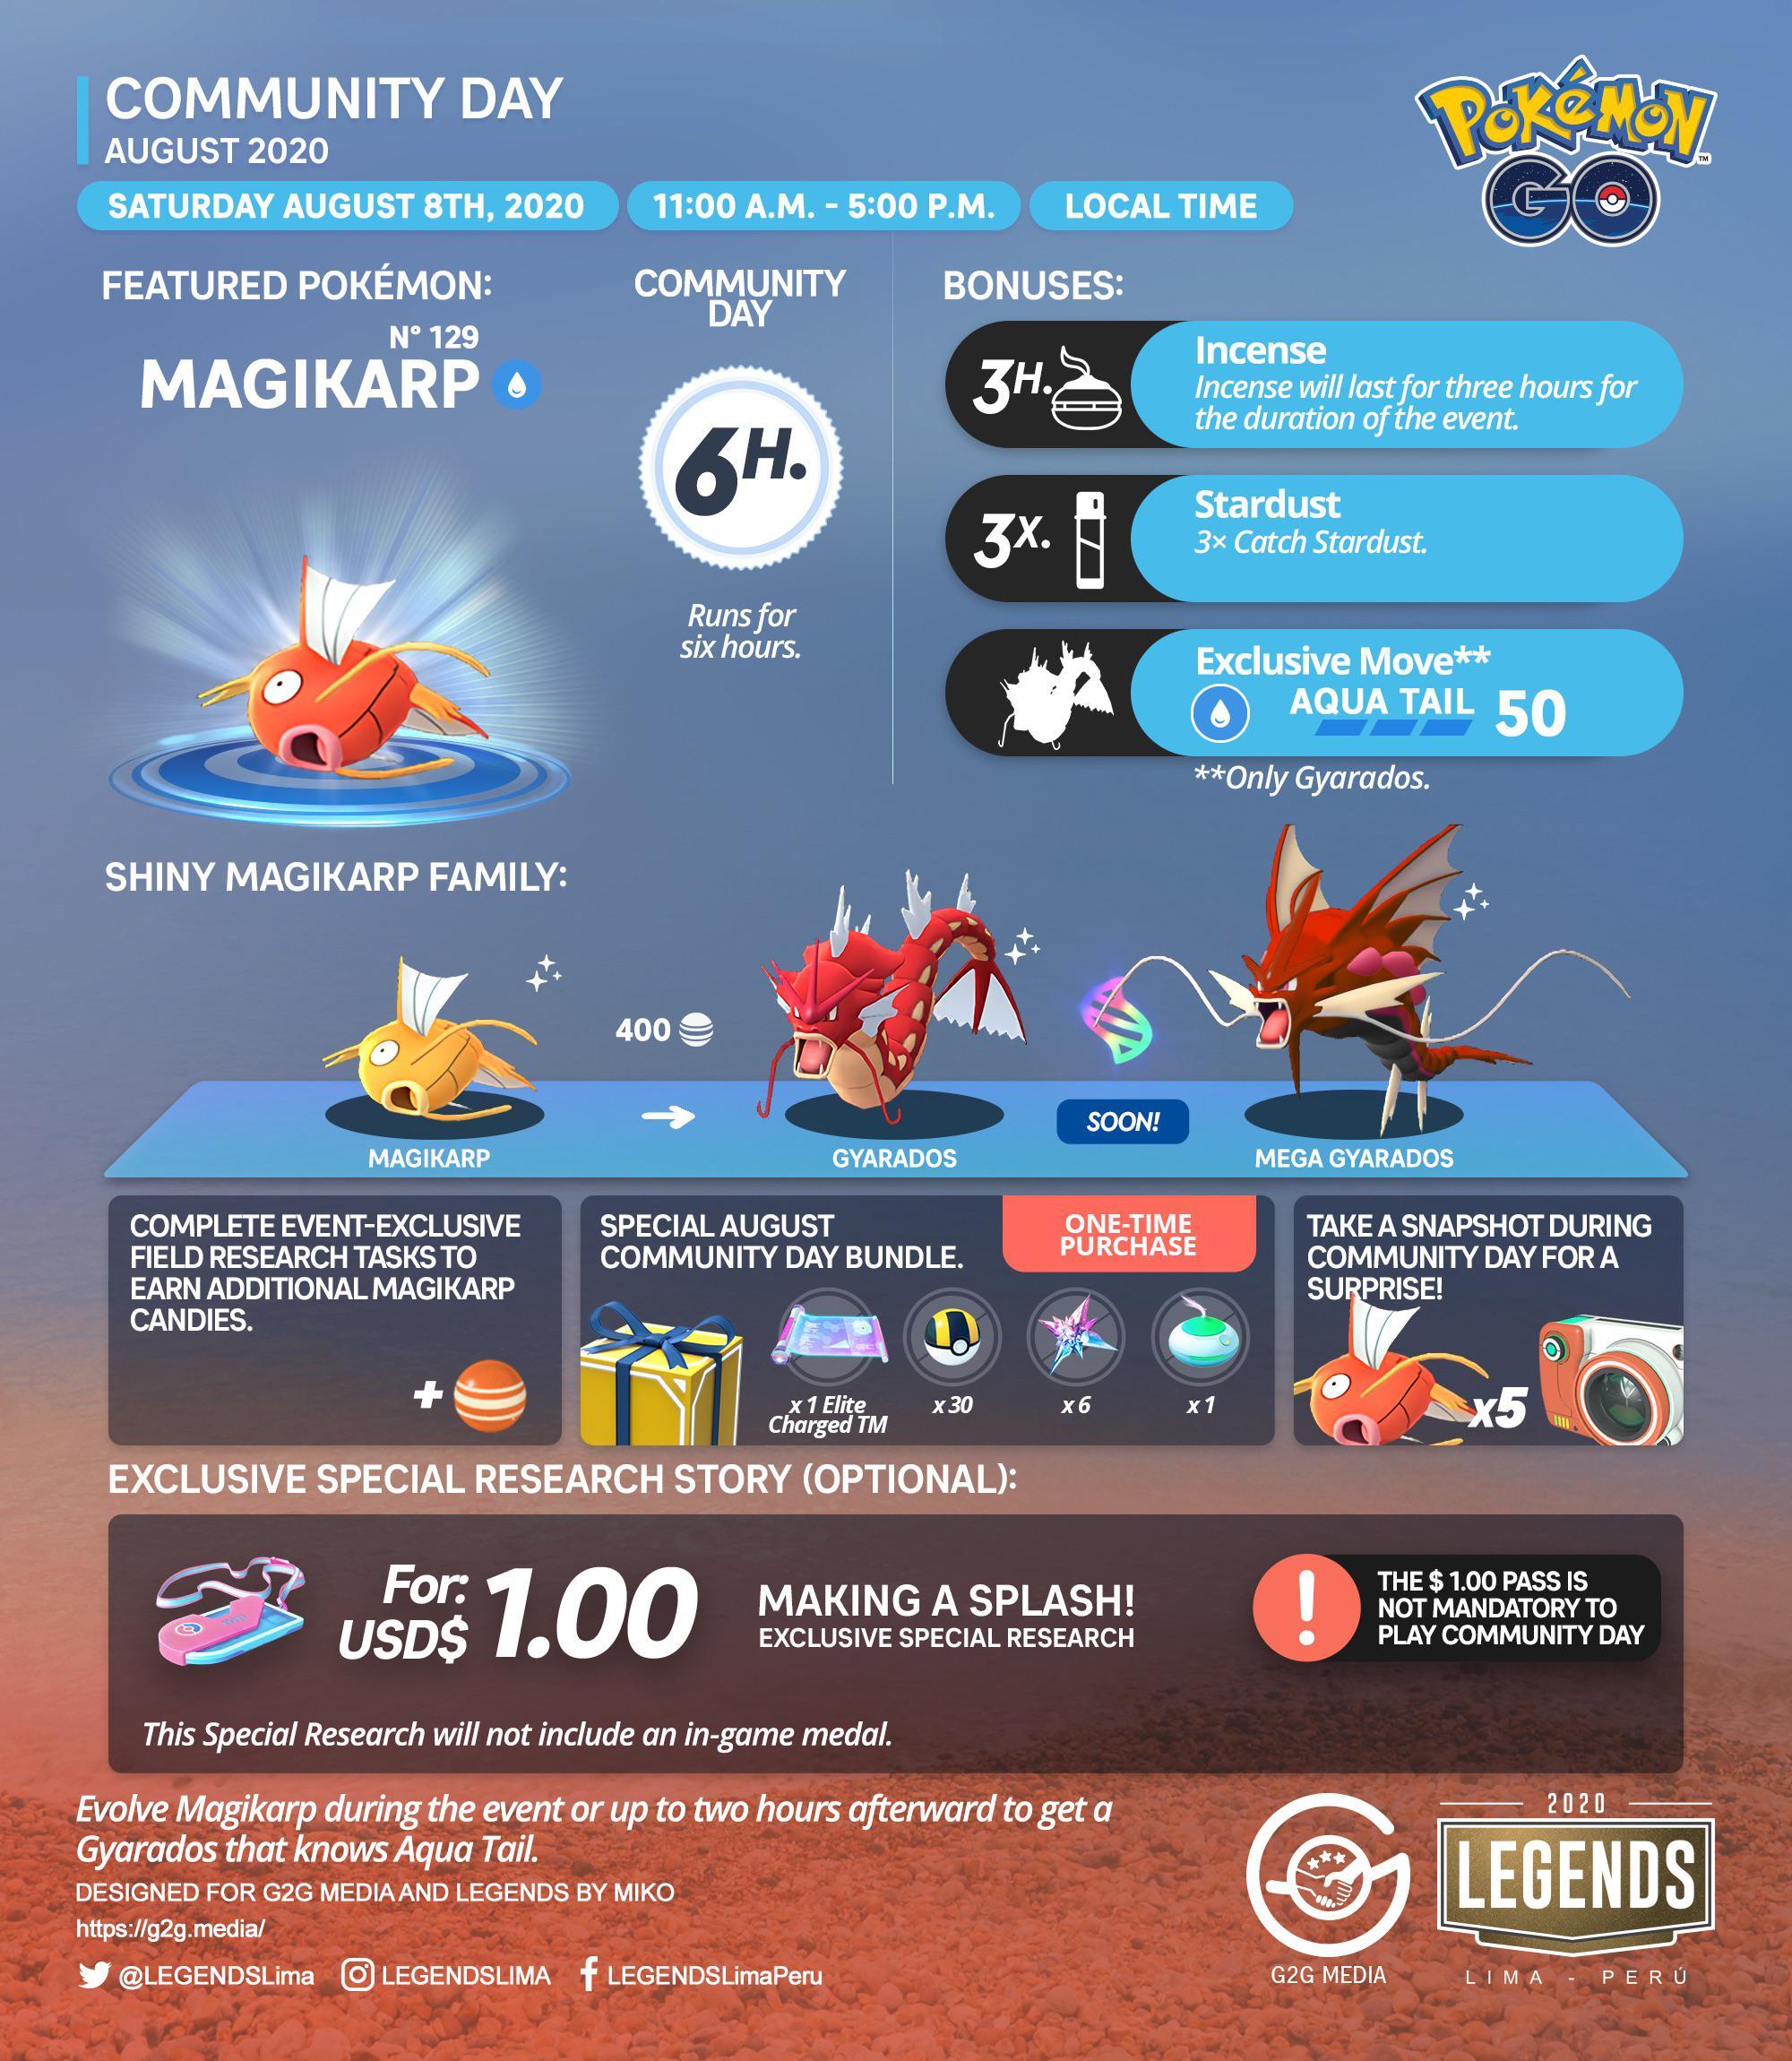 Pokemon Go August 2020 Magikarp Community Day Cheat Sheet